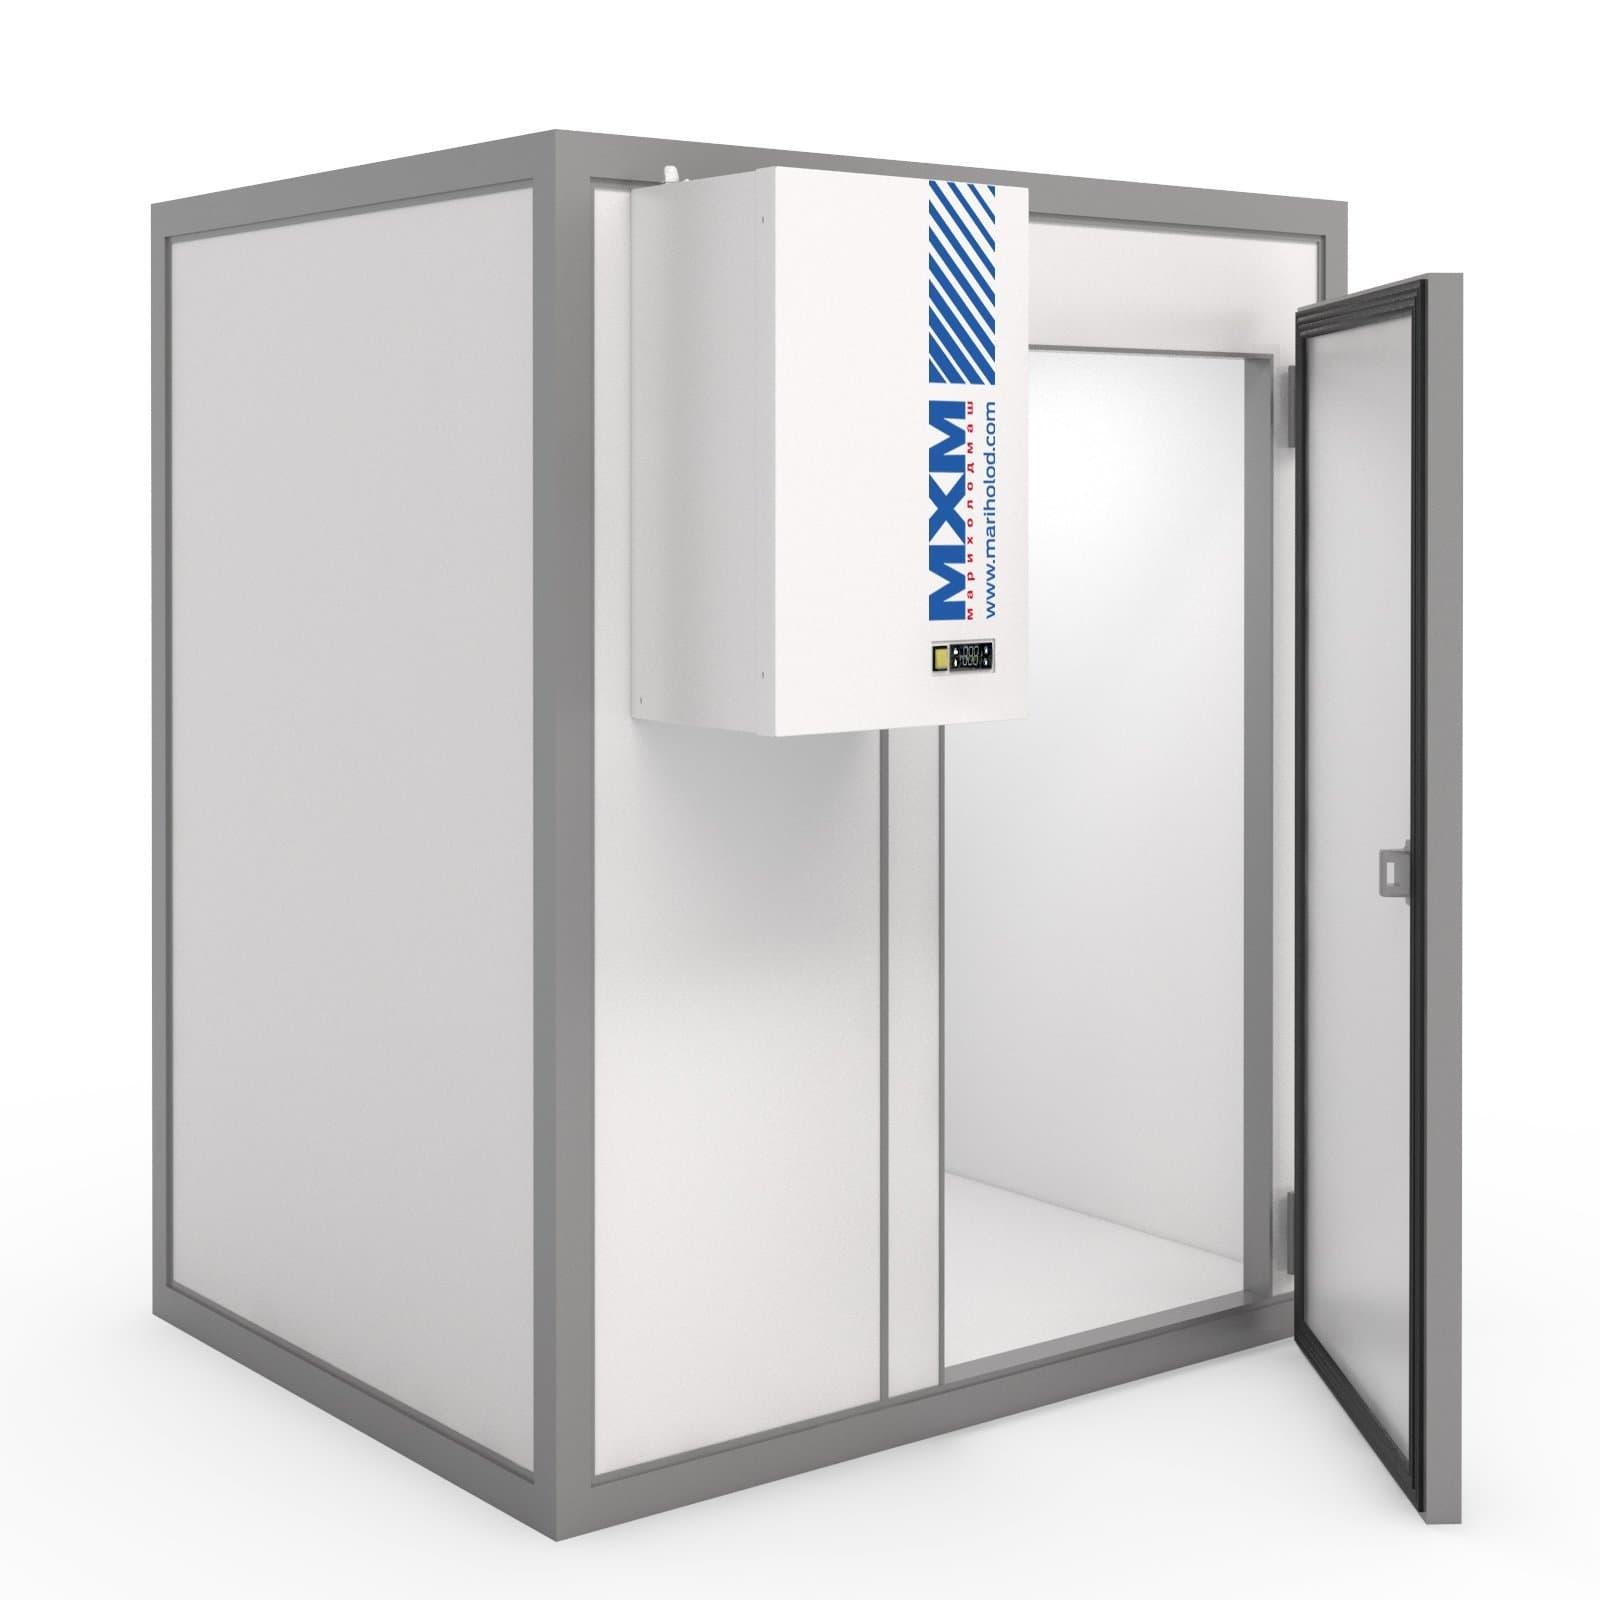 Камера холодильная МХМ КХН-56,45 2260×10660×2720